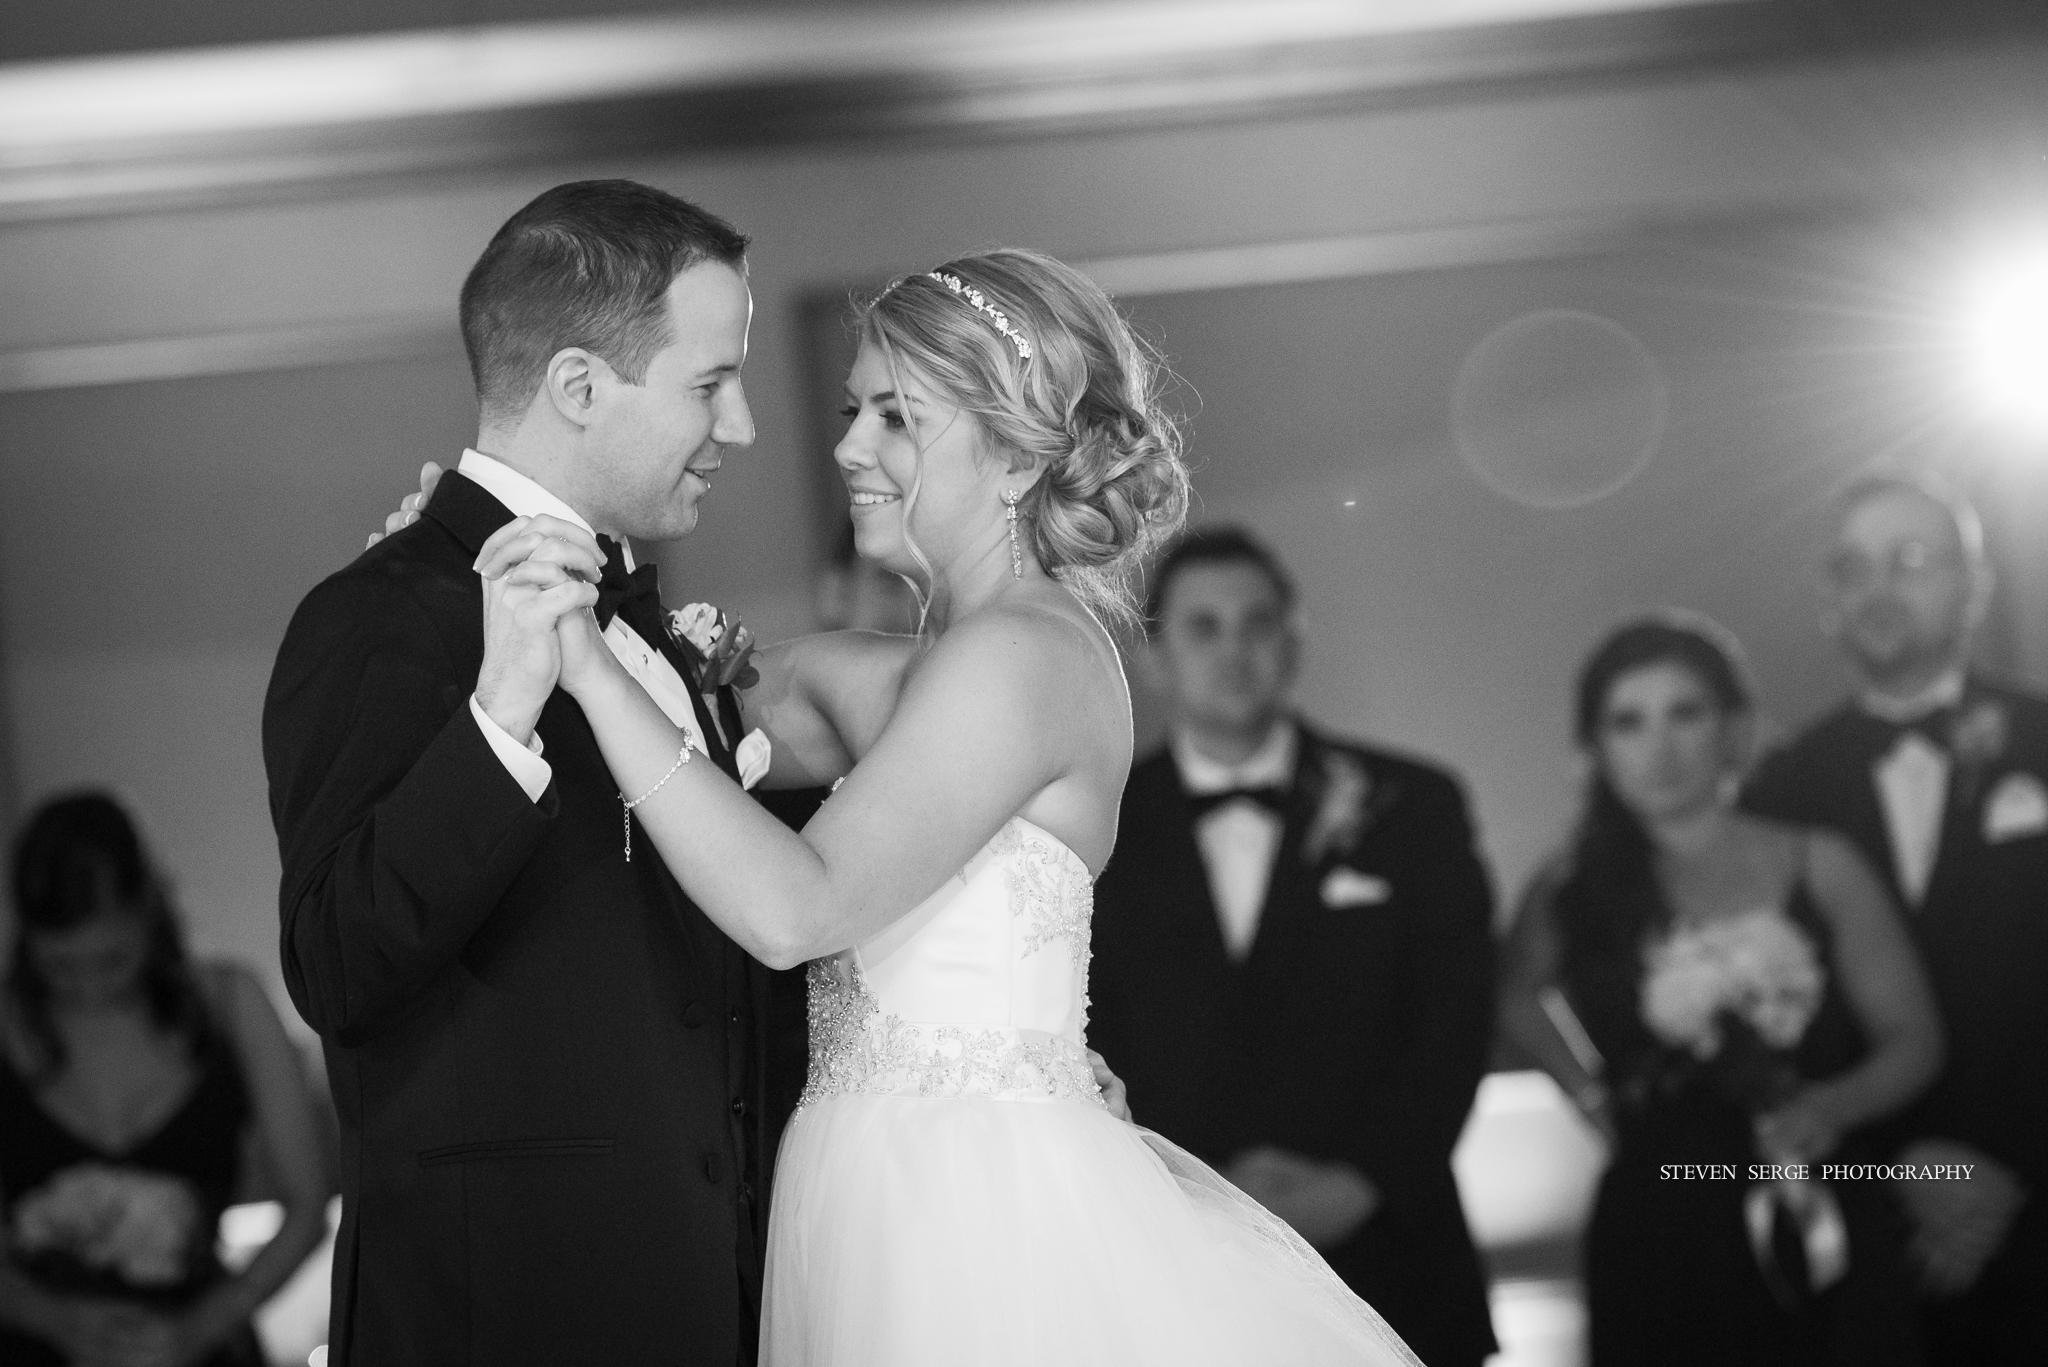 scranton-wedding-photographers-hilton-steven-serge-photography-12.jpg